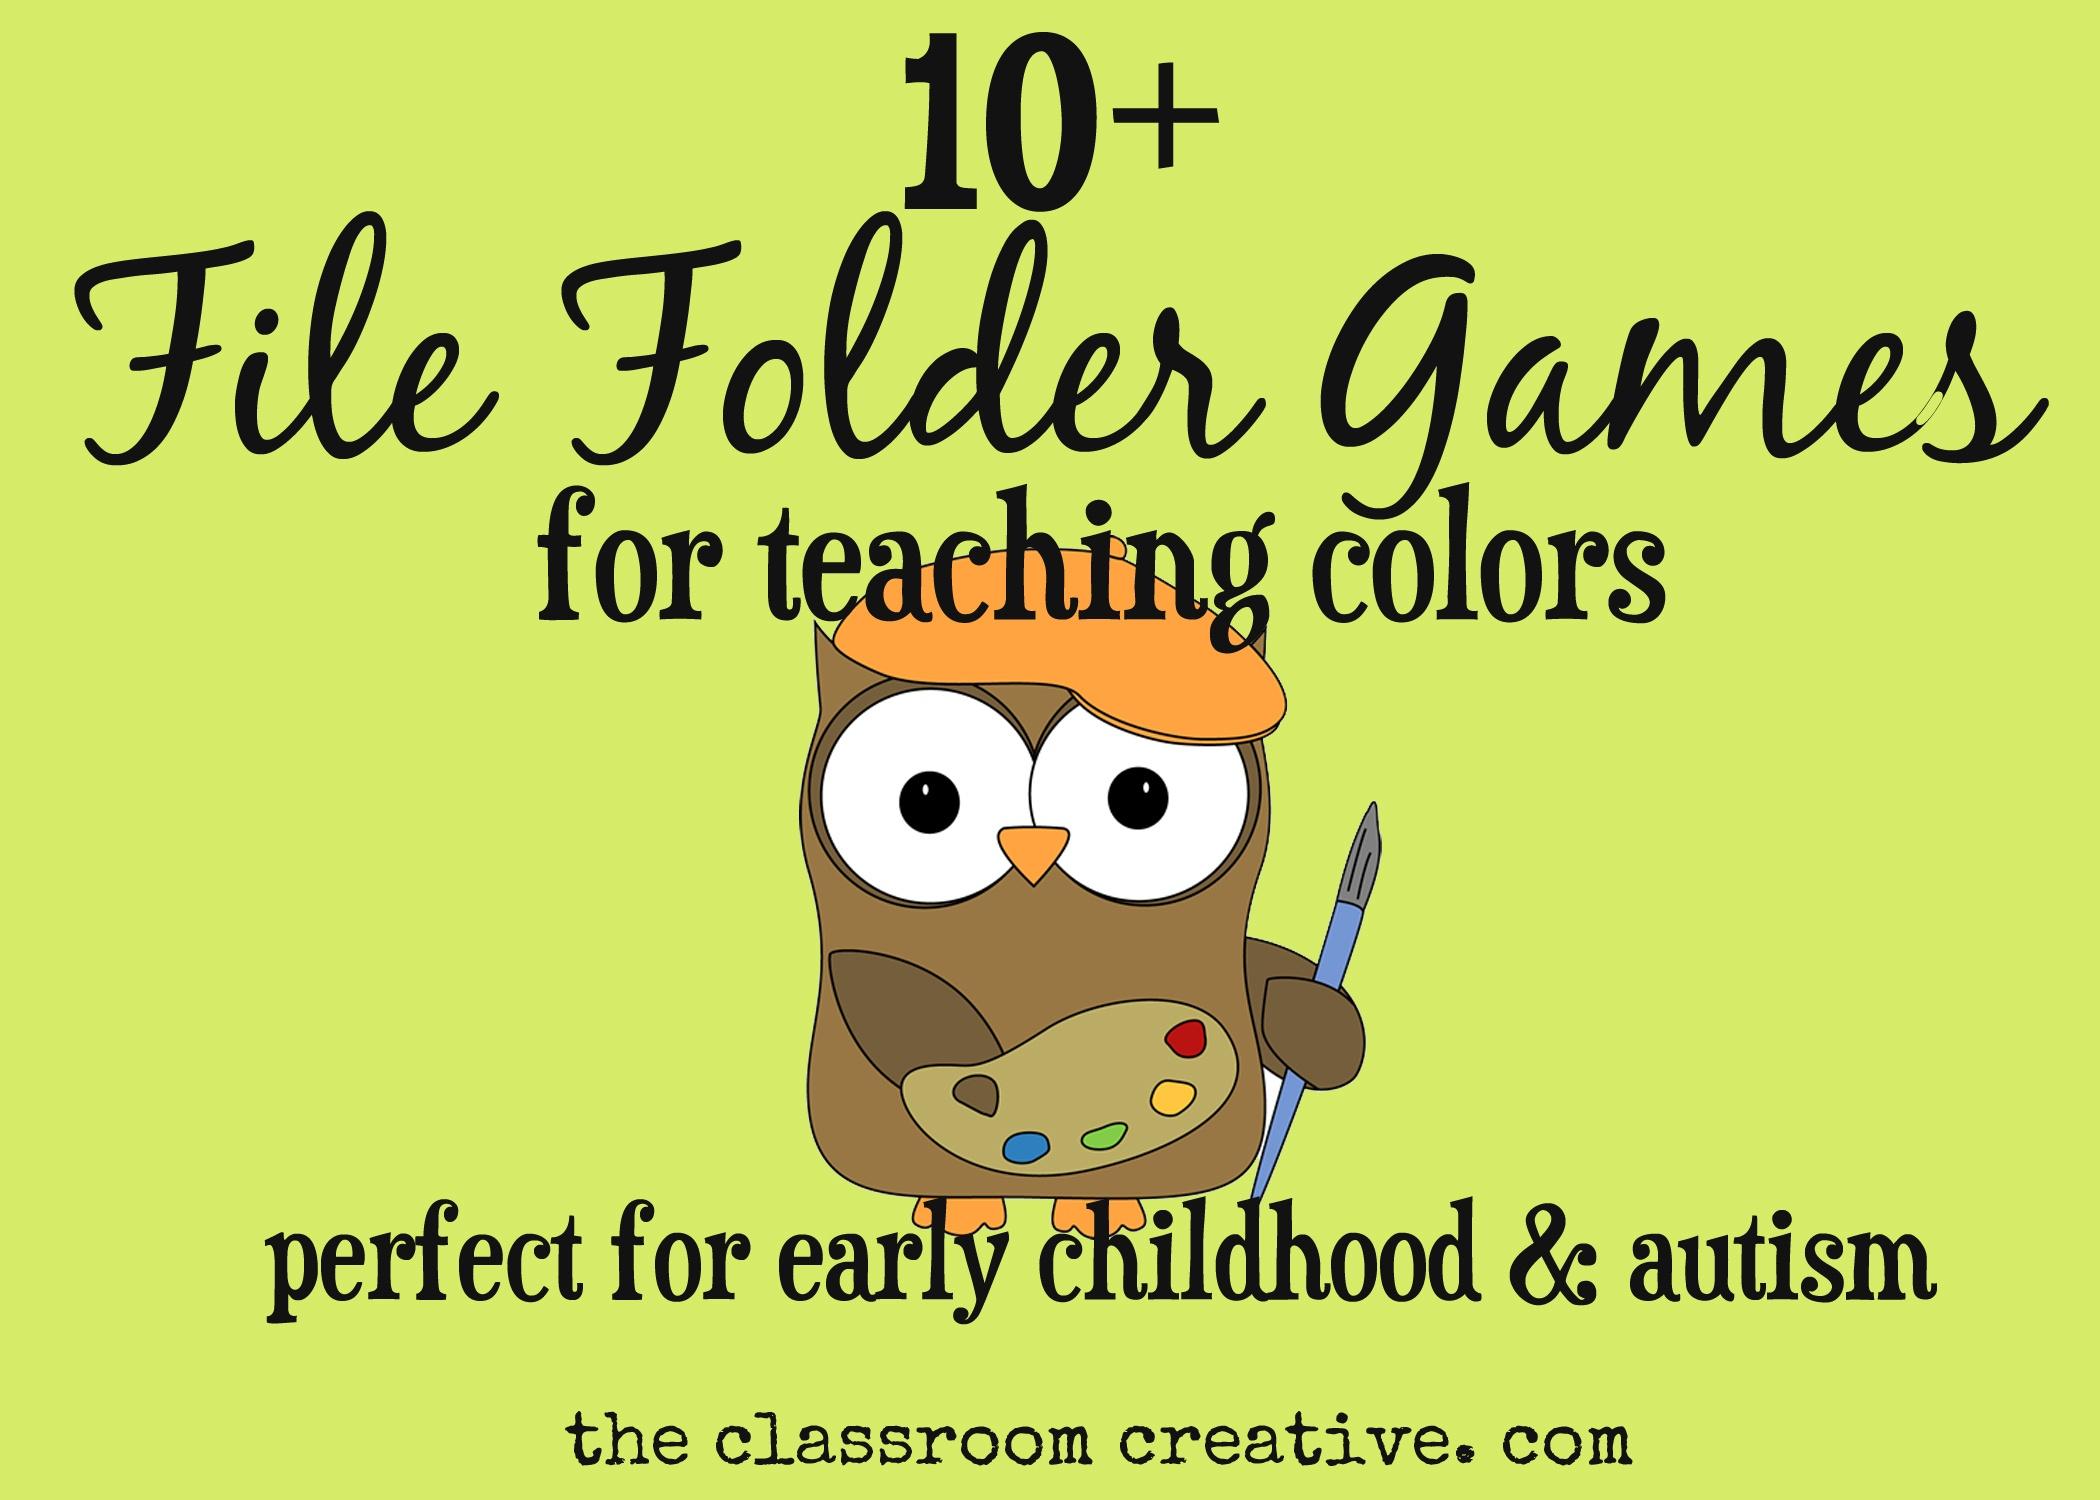 File Folder Games For Teaching Colors - Free Printable File Folder Games